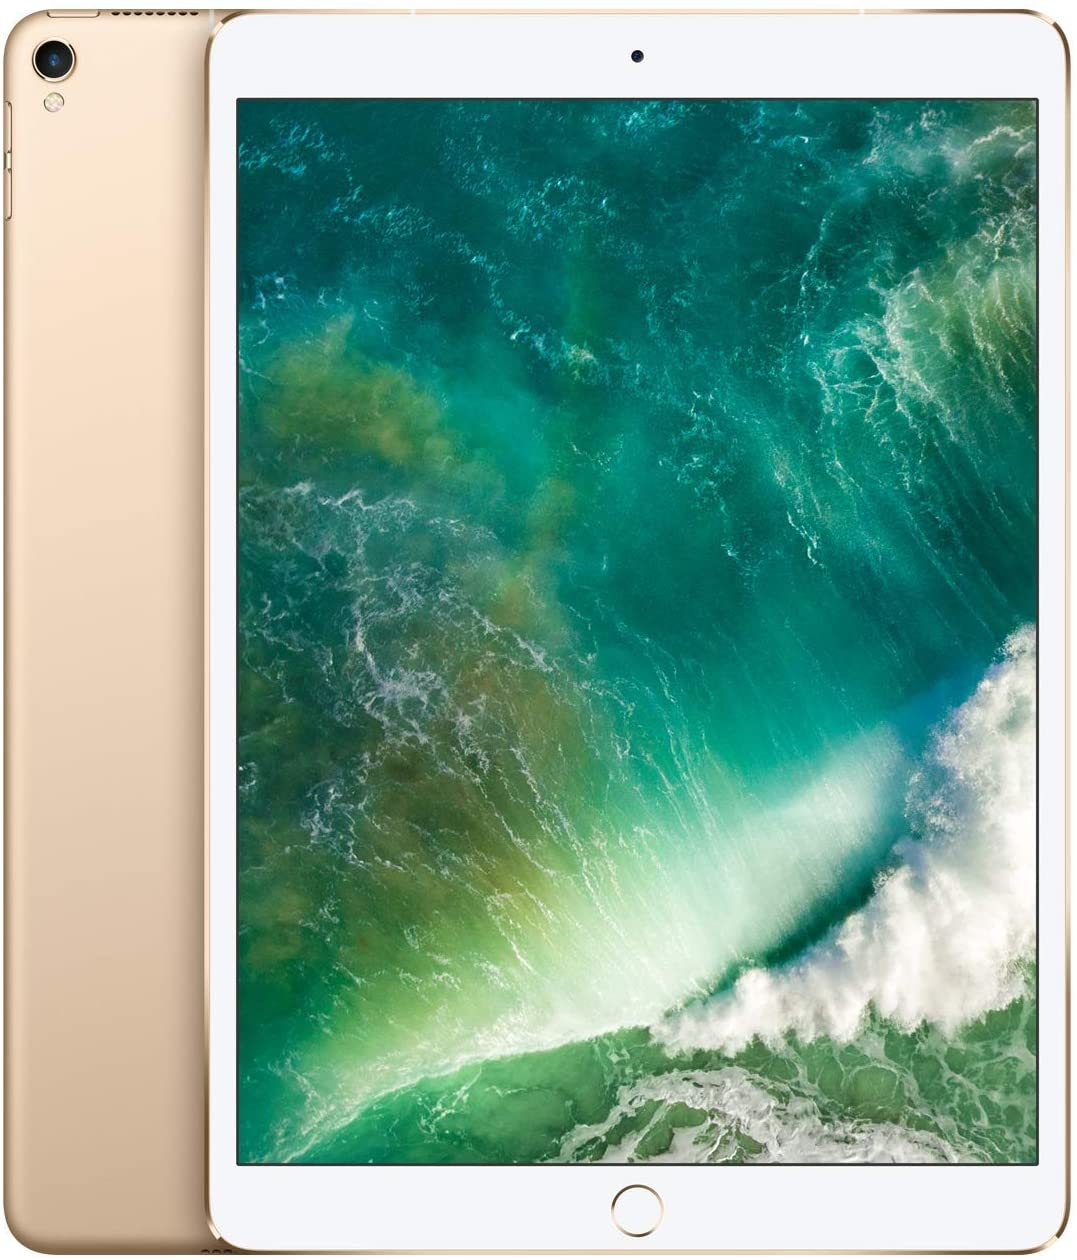 Apple iPad Pro at its lowest Amazon price yet